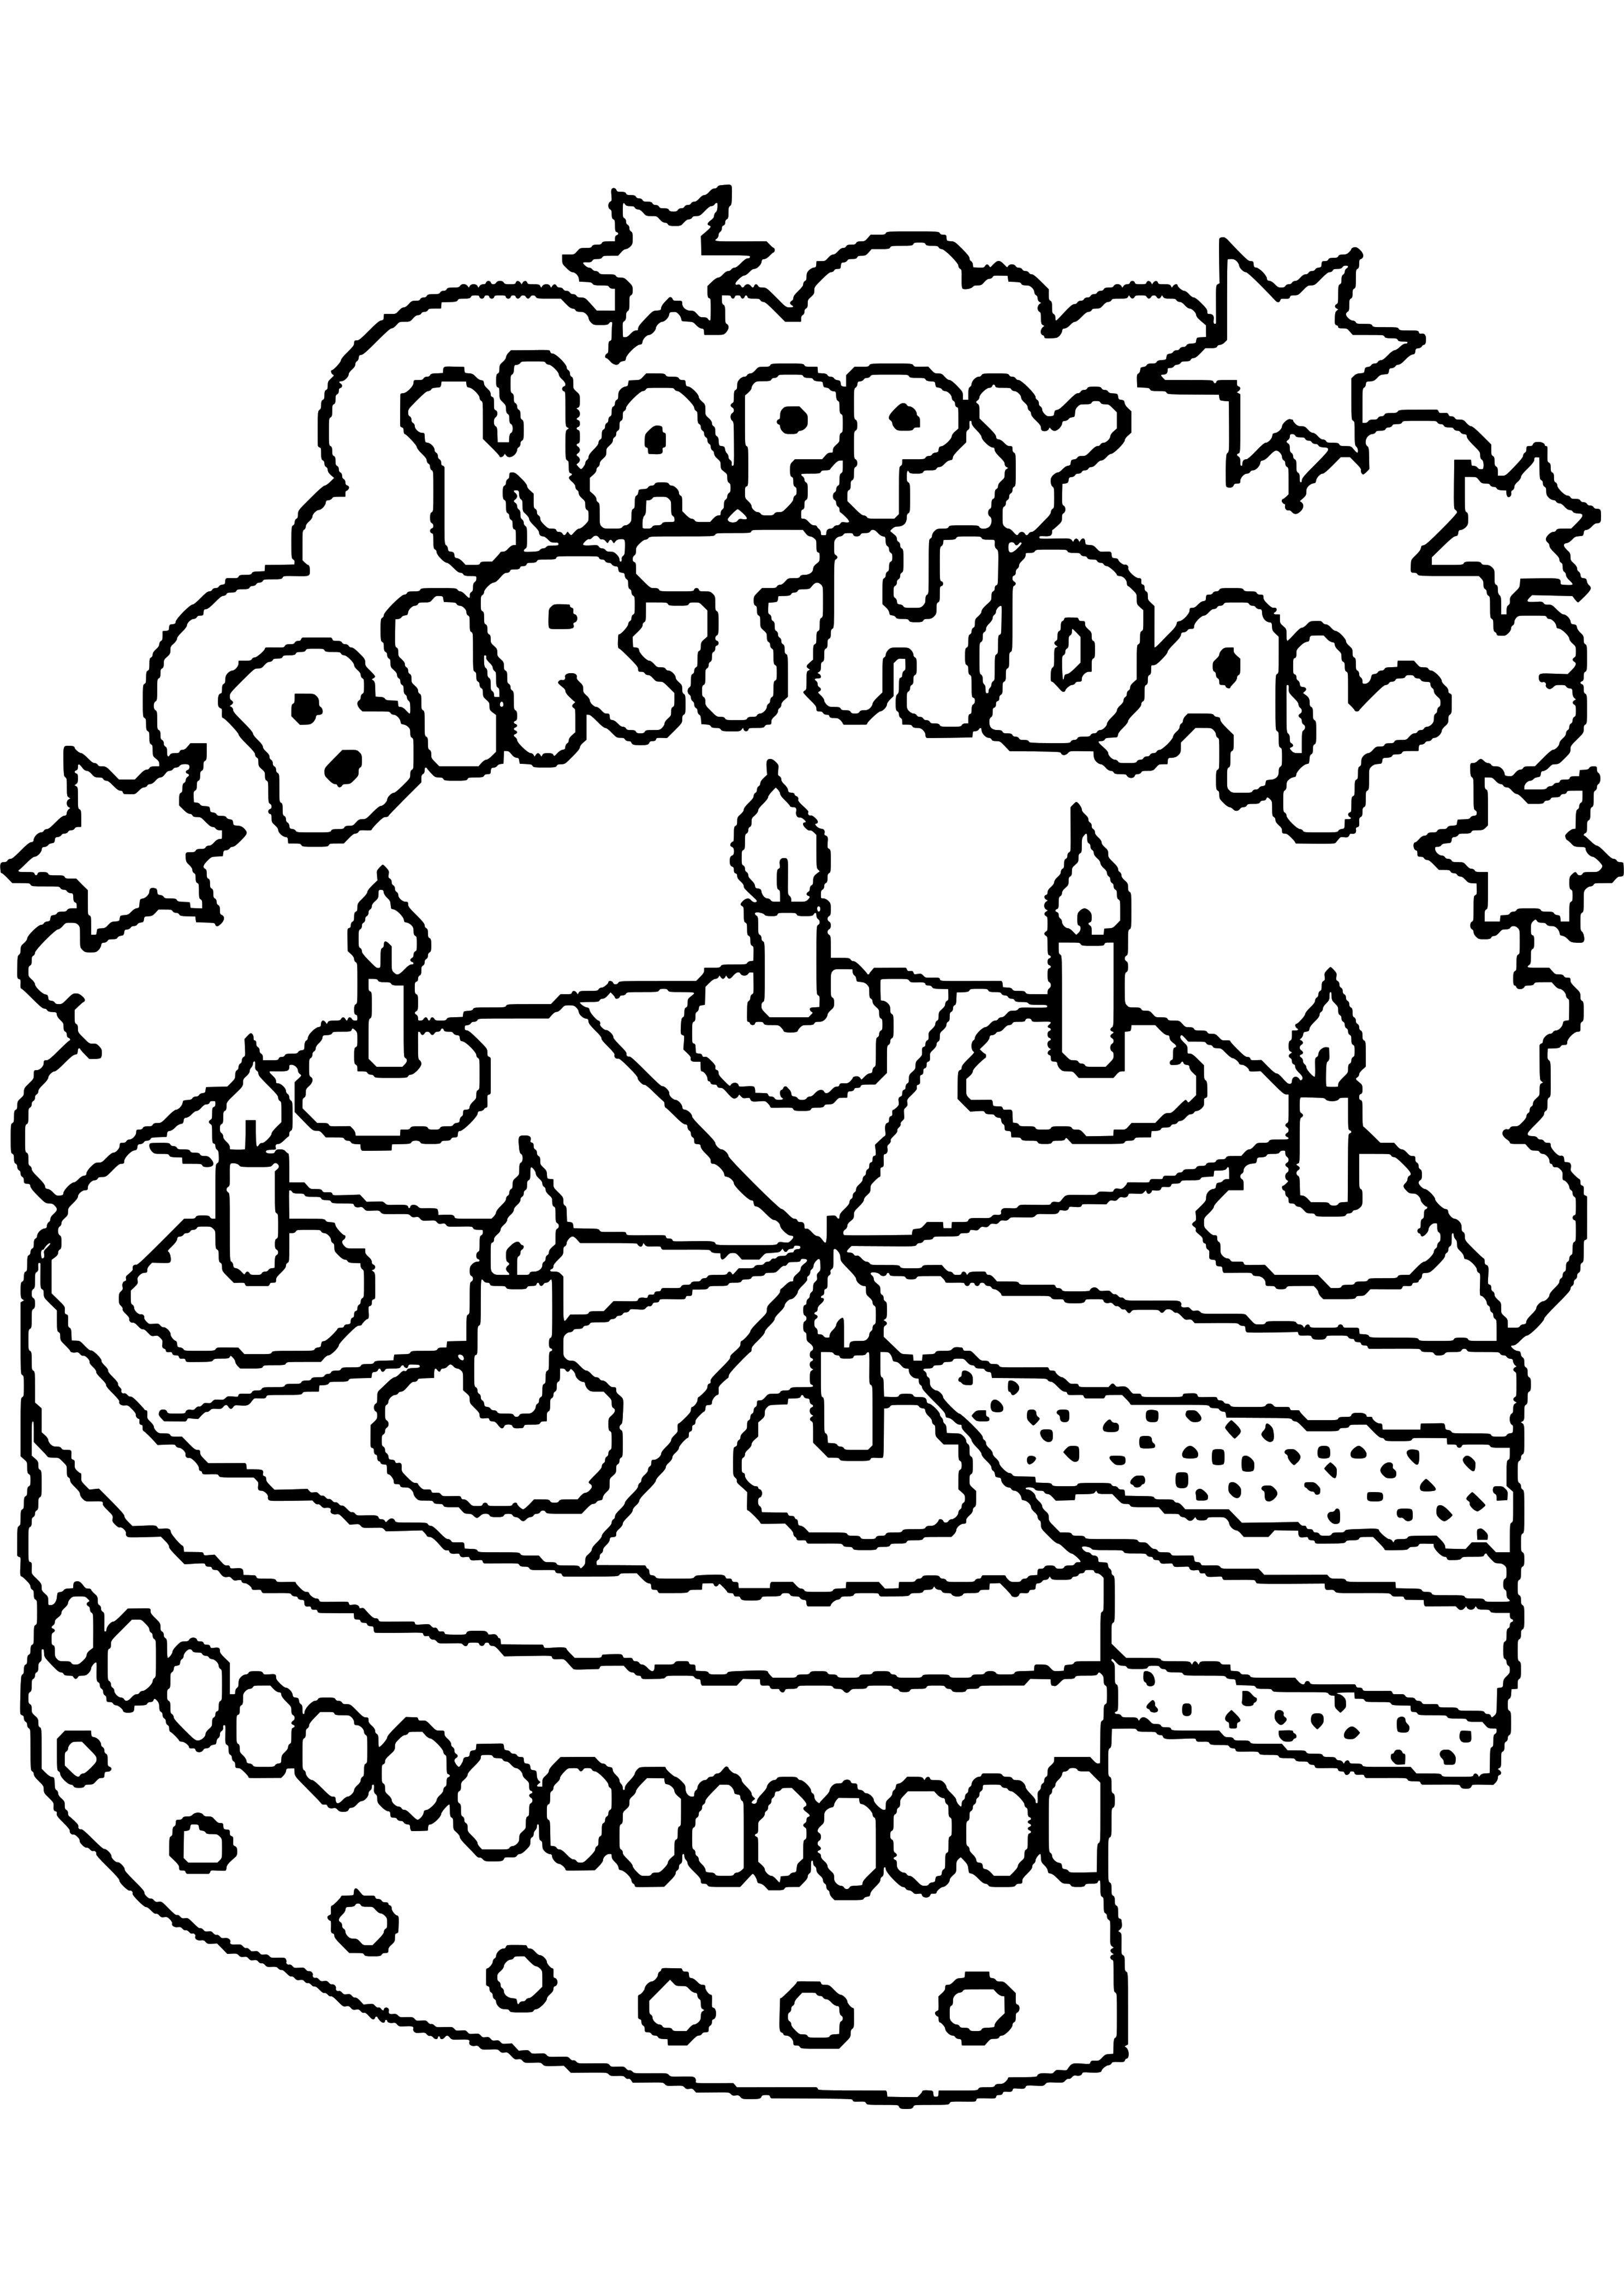 Verjaardag 40 Jaar Kleurplaat Check More At Https Olivinum Com Verjaardag 40 Jaar Kleurplaat Kleurplaten Verjaardag Gefeliciteerd